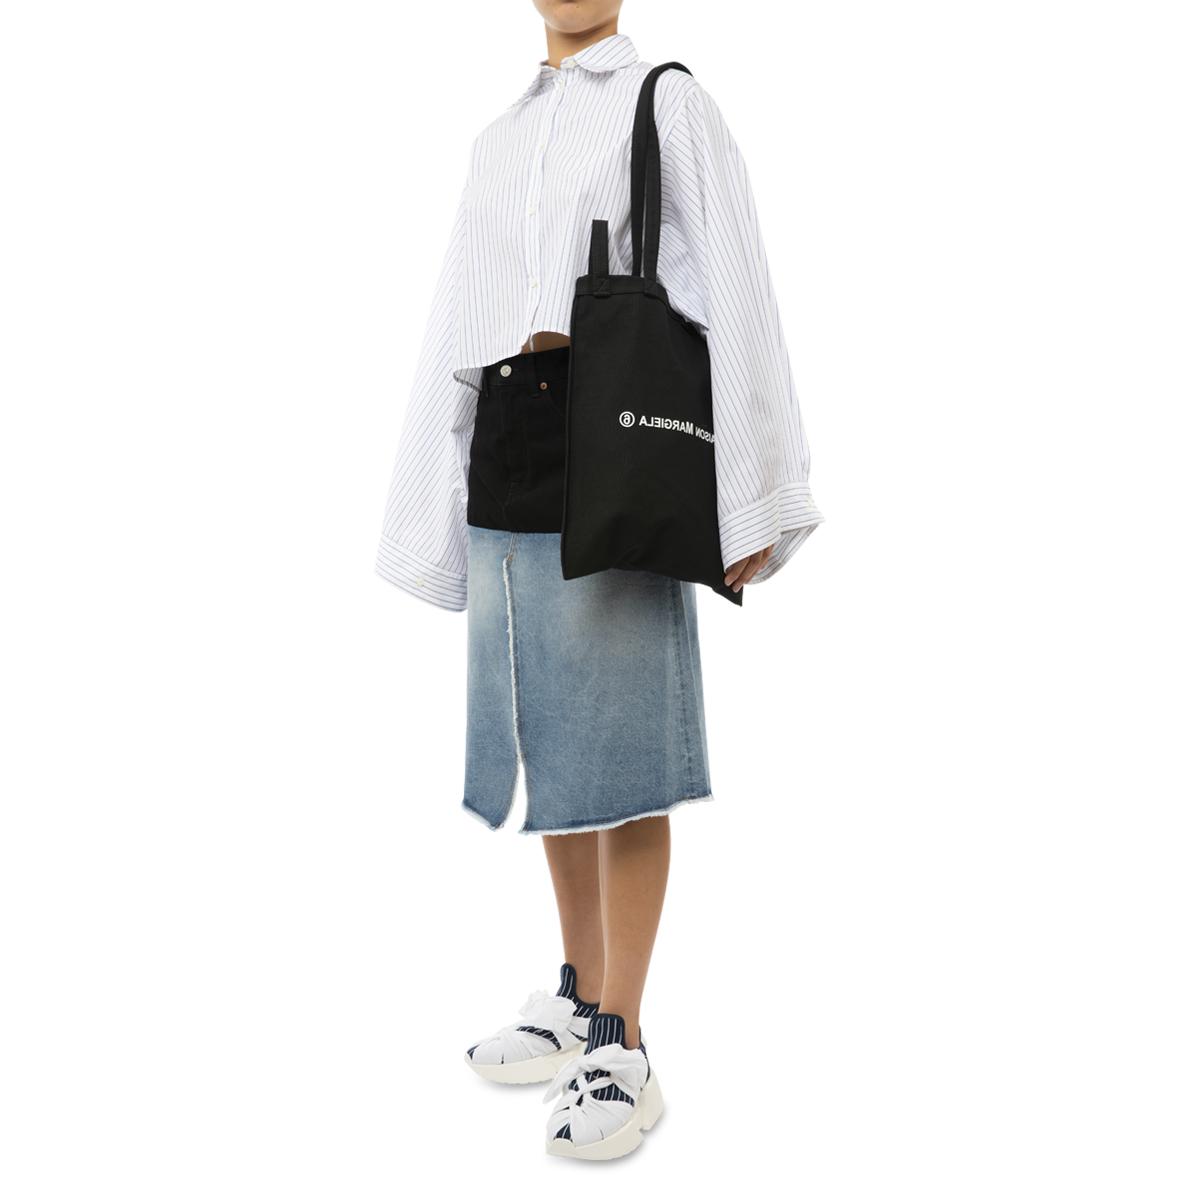 MM6 Maison Margiela 14 Oz Indigo Spliced Denim Skirt